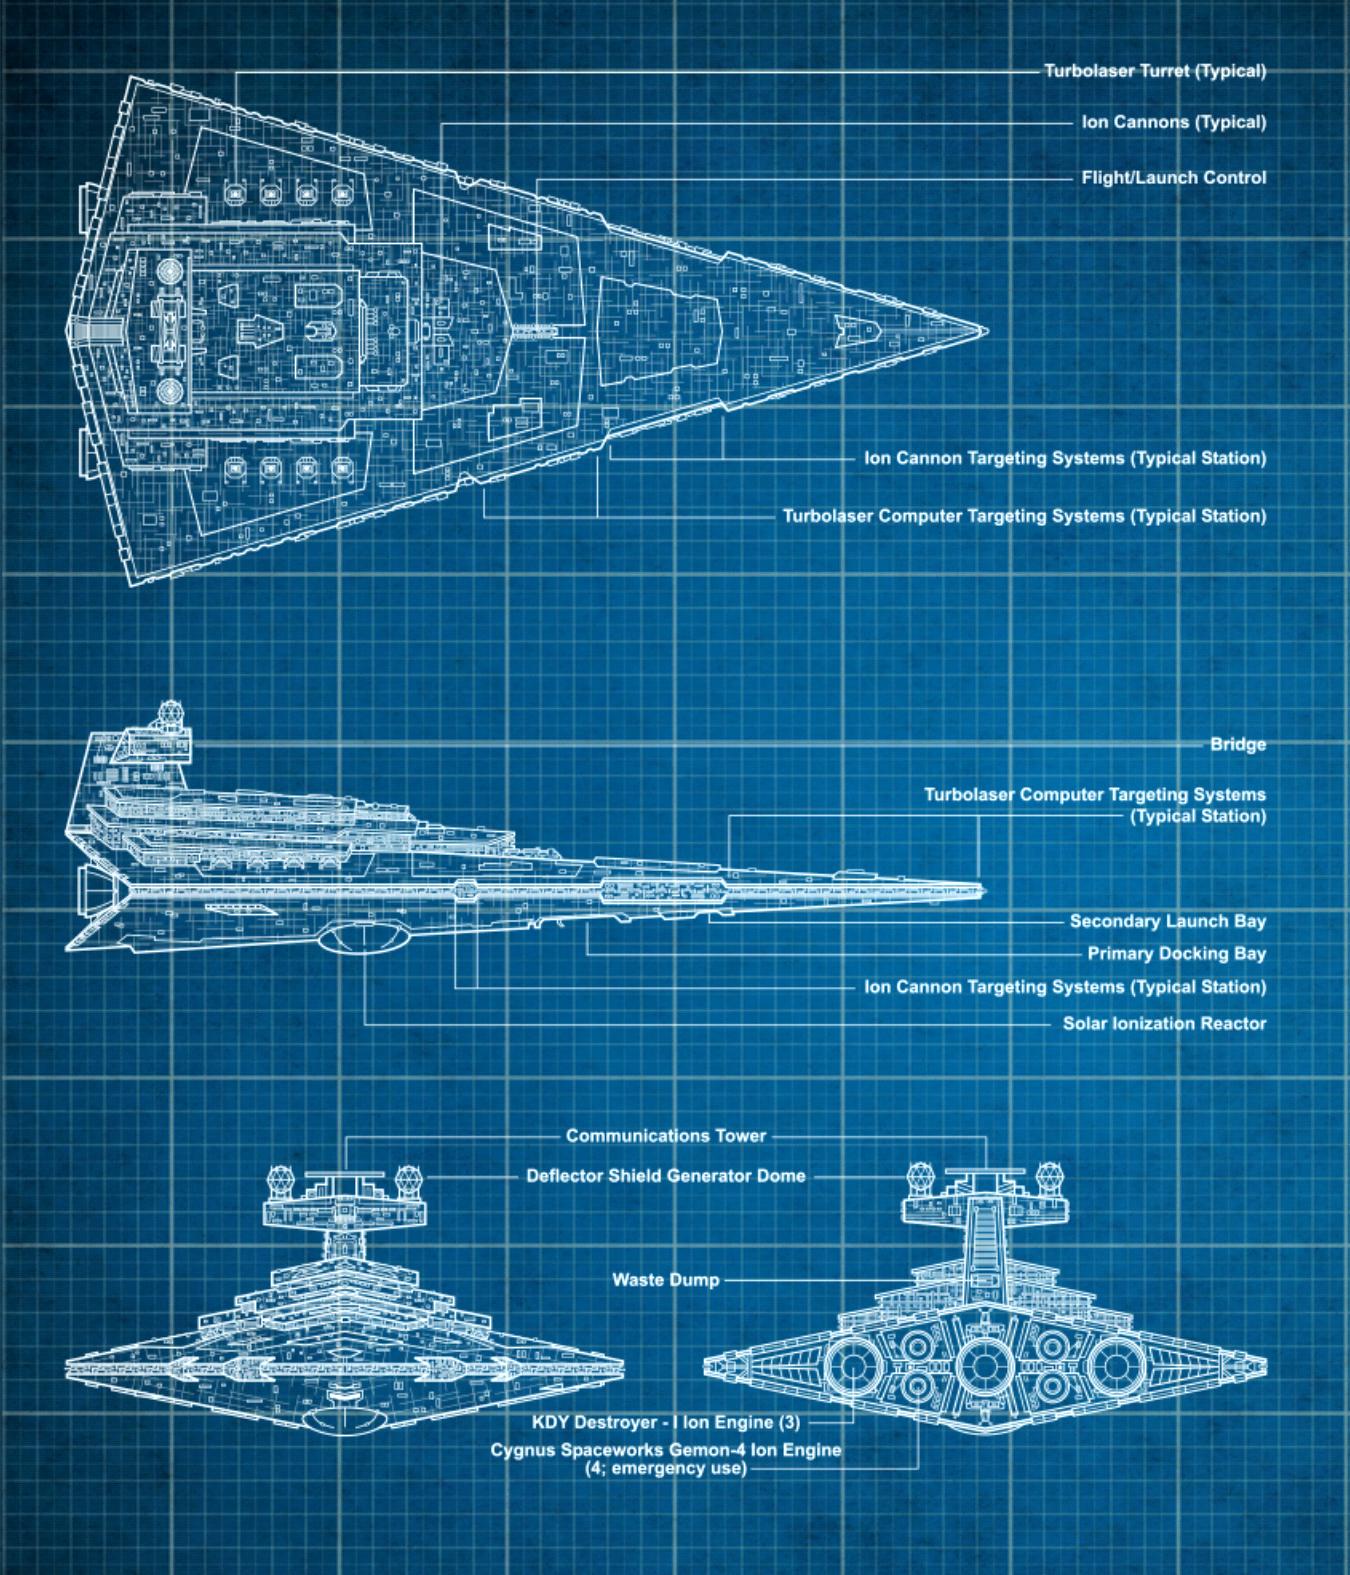 Imperial-class Star Destroyer | Wookieepedia | FANDOM